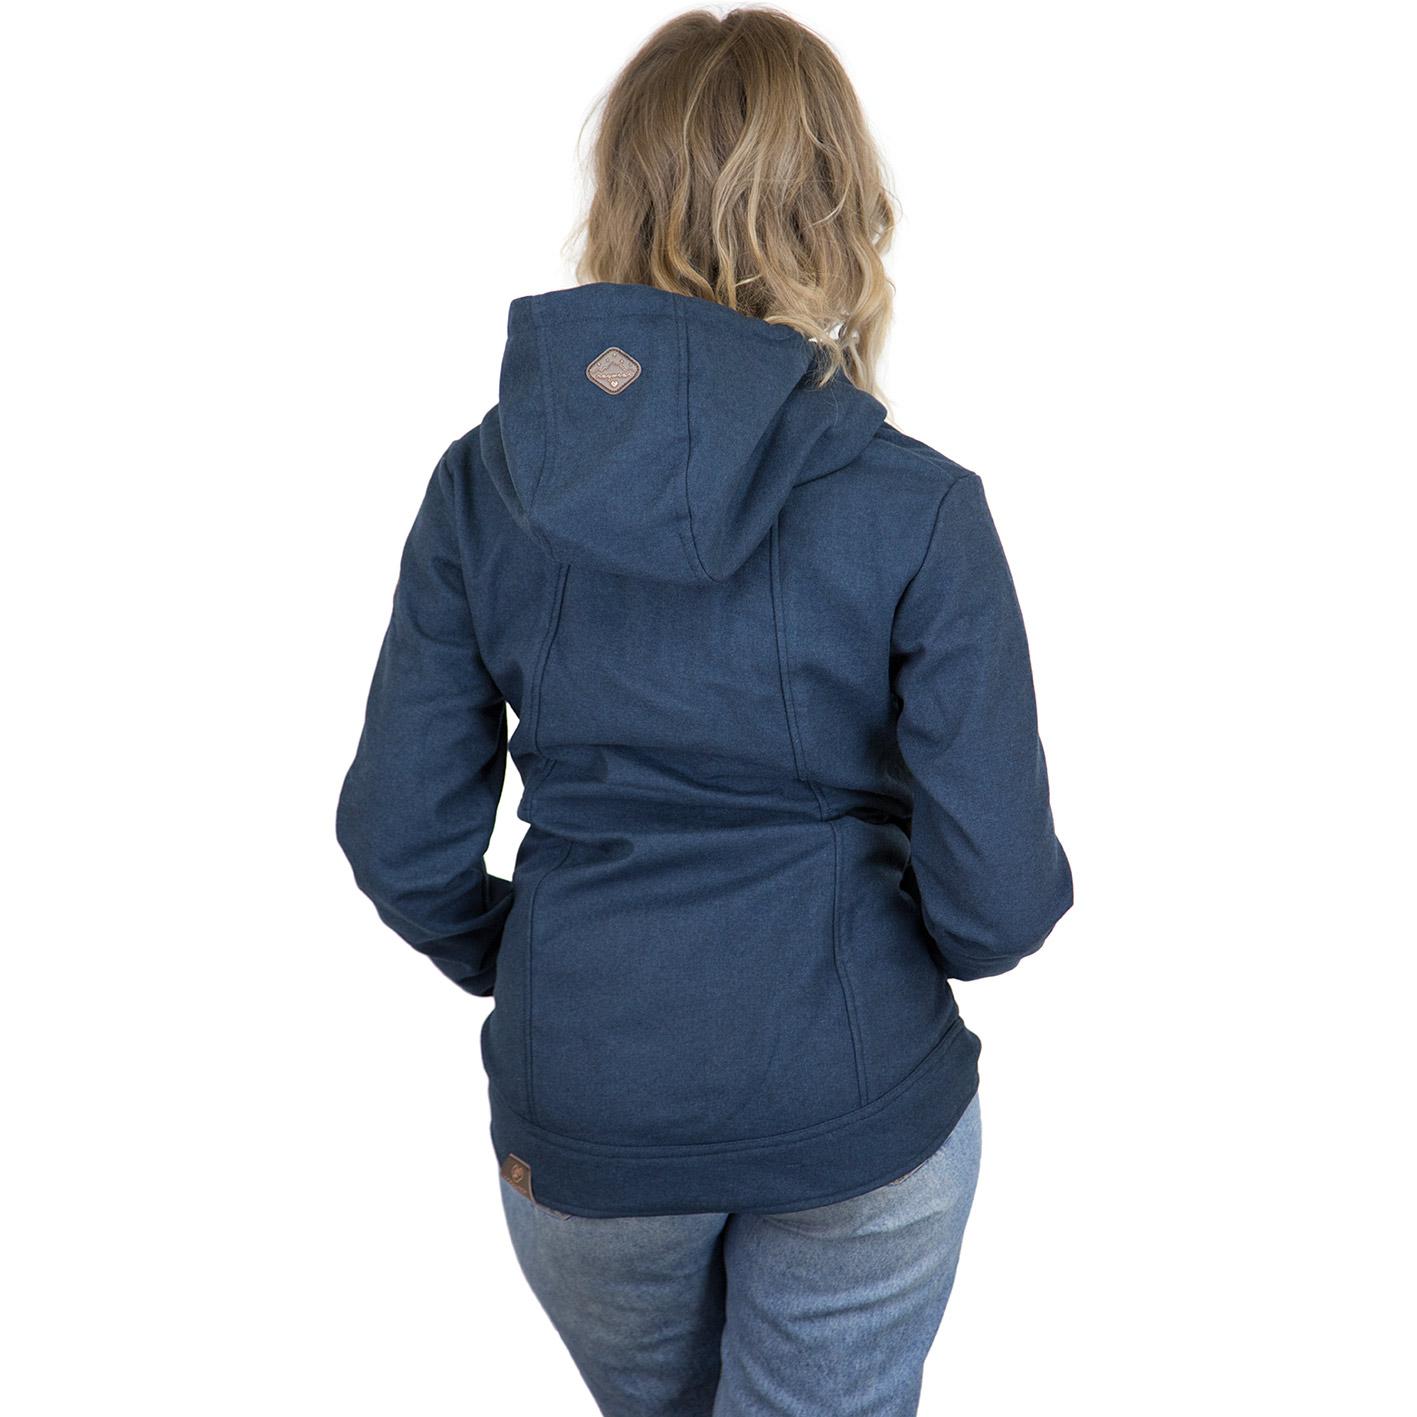 huge discount 483de 25c5d Ragwear Damen-Jacke Enrica blau